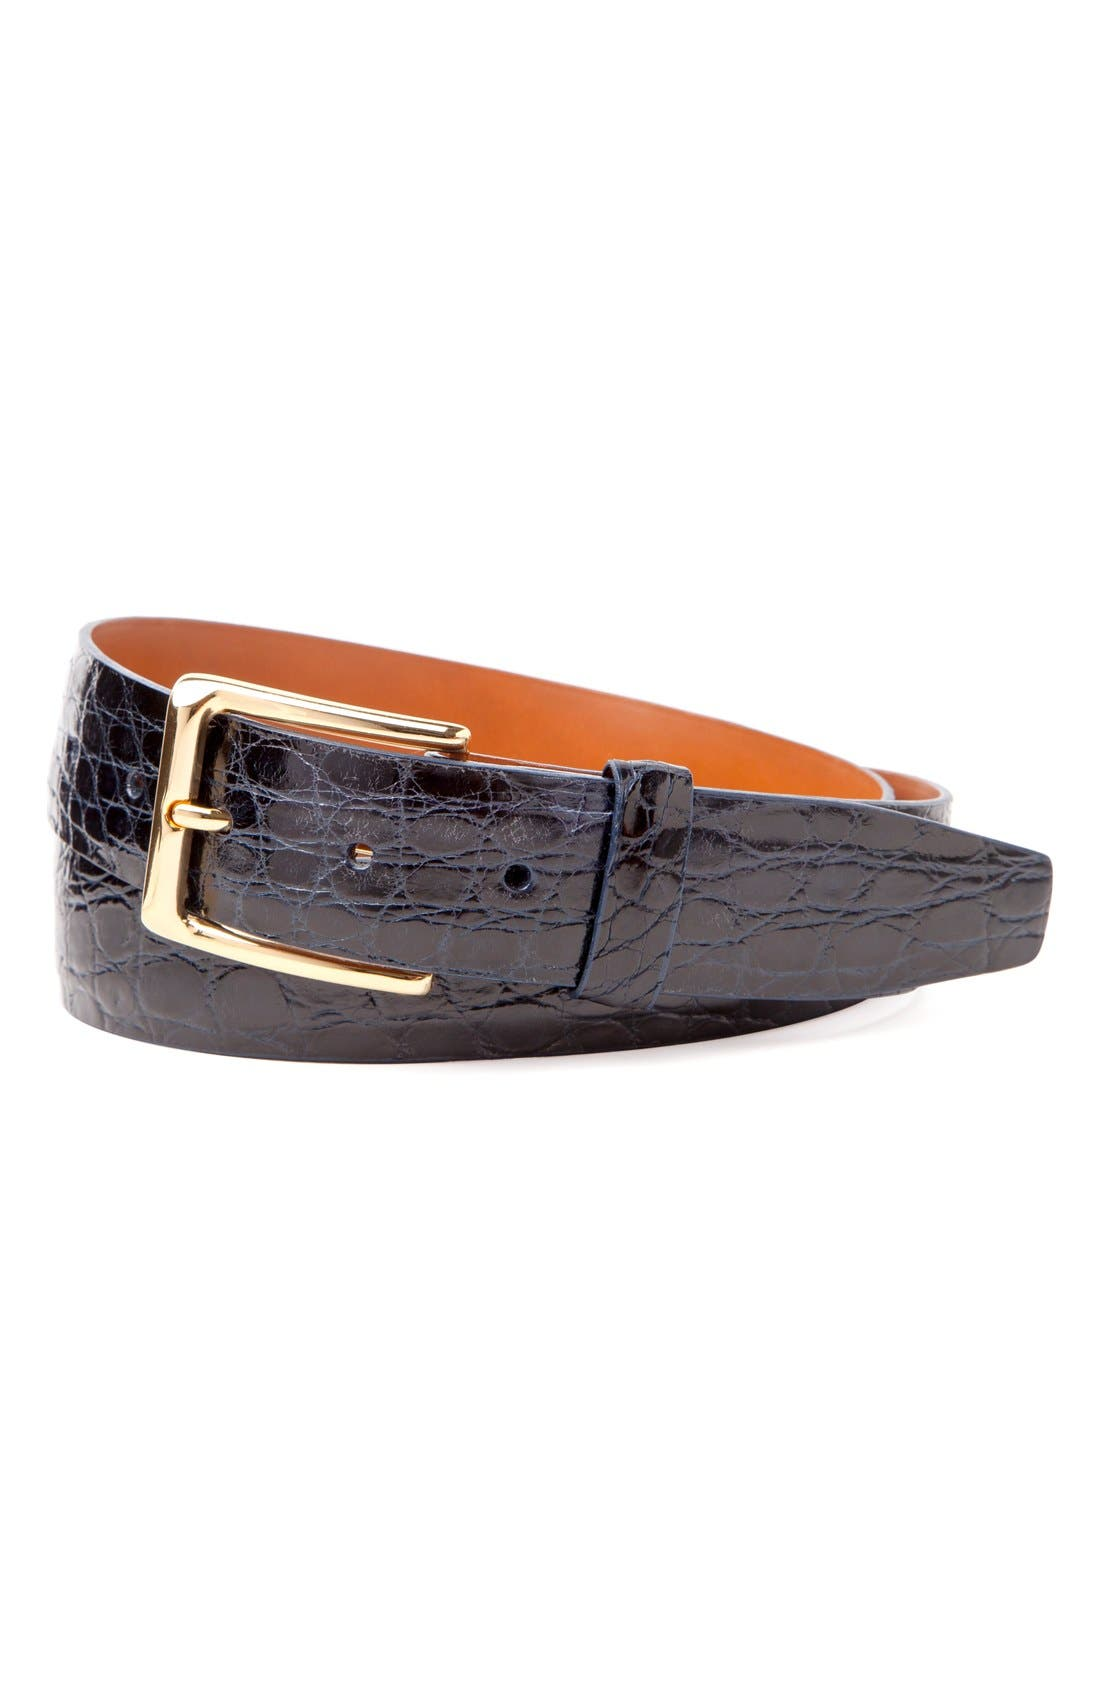 Main Image - Trafalgar 'Newington' Genuine Crocodile Leather Belt